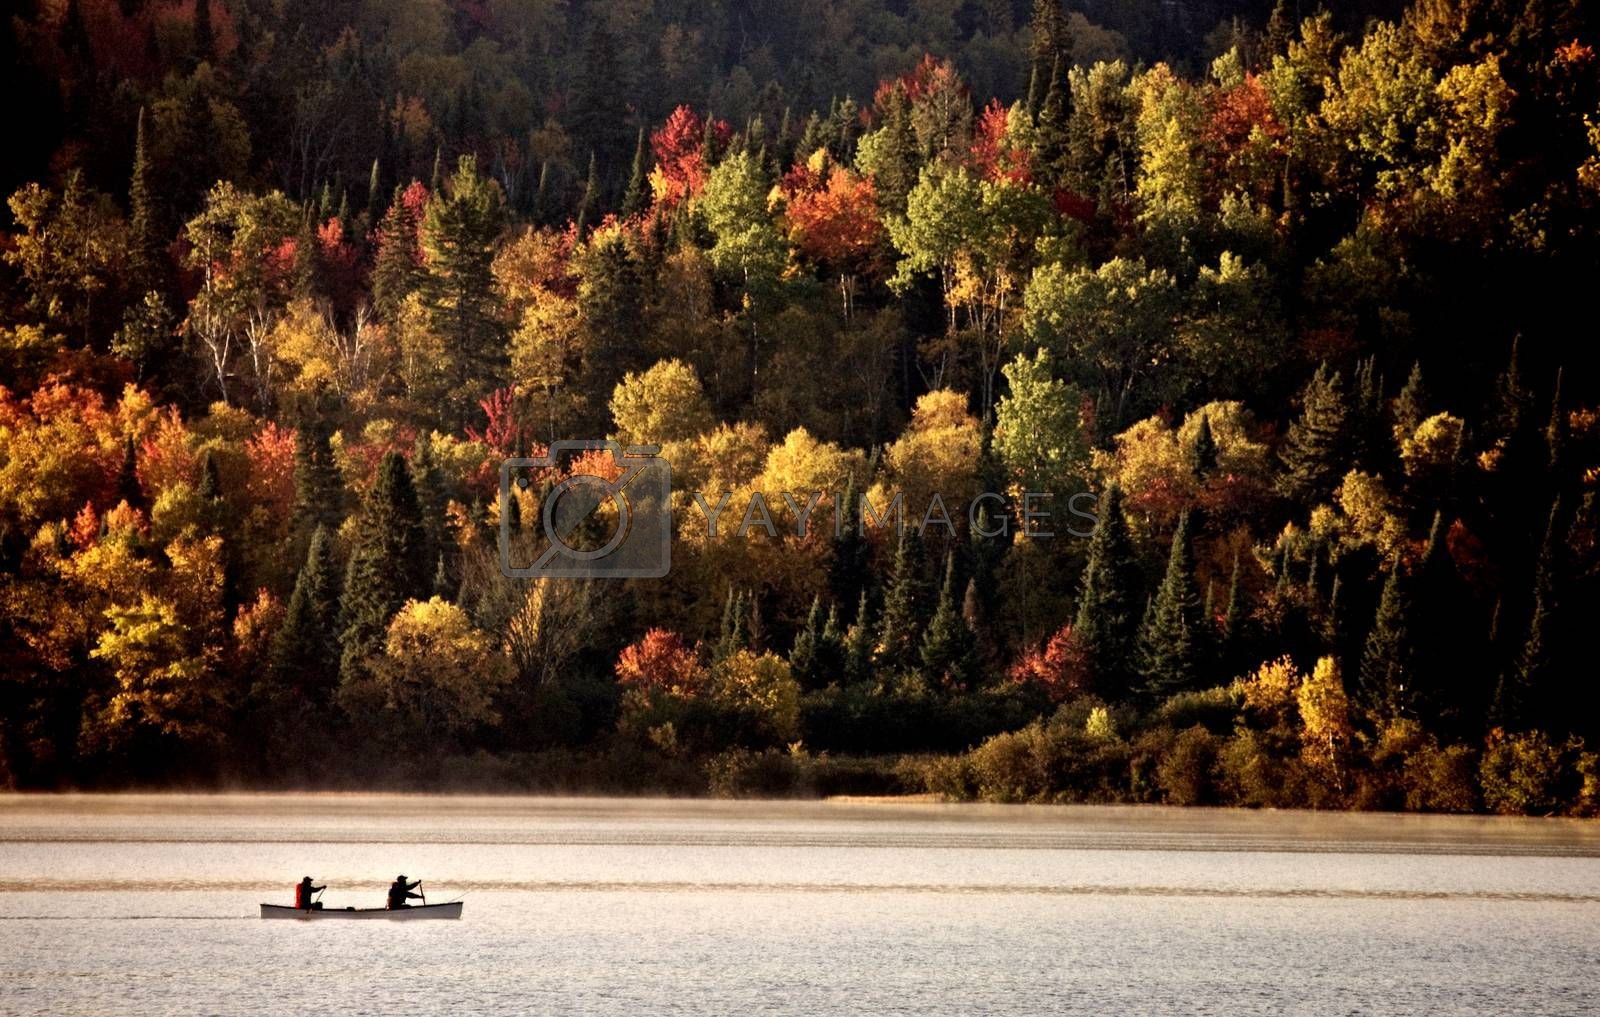 Lake in Autumn Algonquin Muskoka Ontario colors canoe